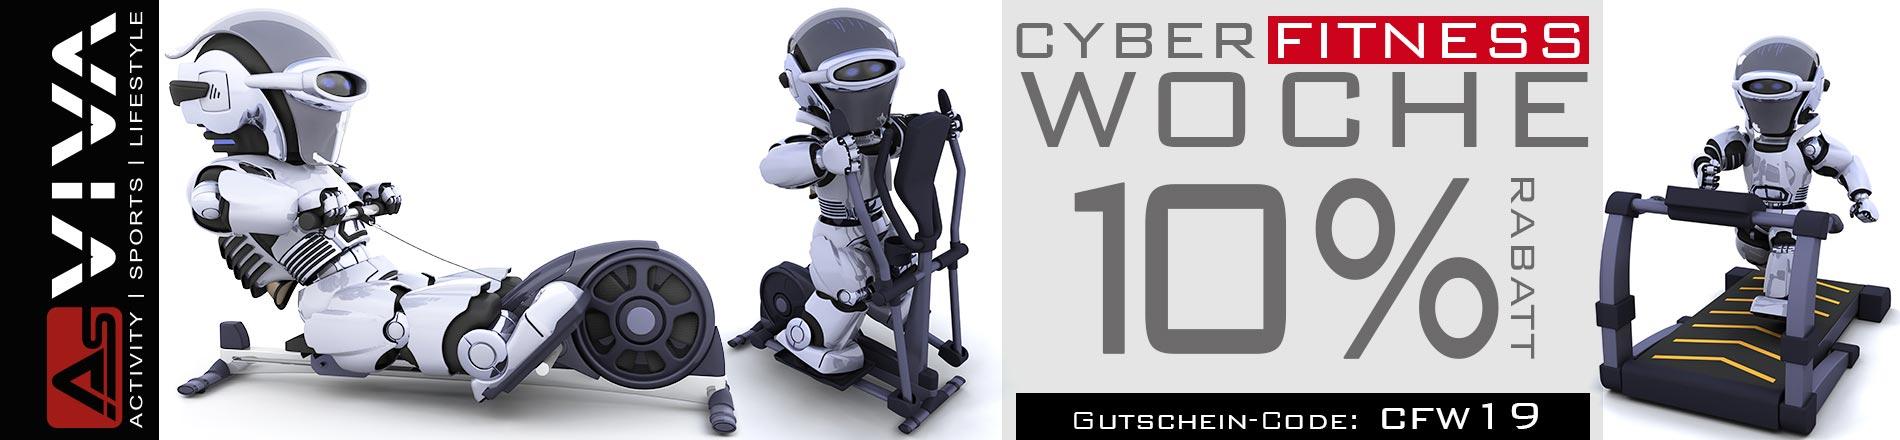 AsVIVA Cyber Fitness Woche 10% Rabatt-Gutschein Aktion für AsVIVA Fitnessgeräte, E-Bikes, Gartenmöbel & Keramikgrills